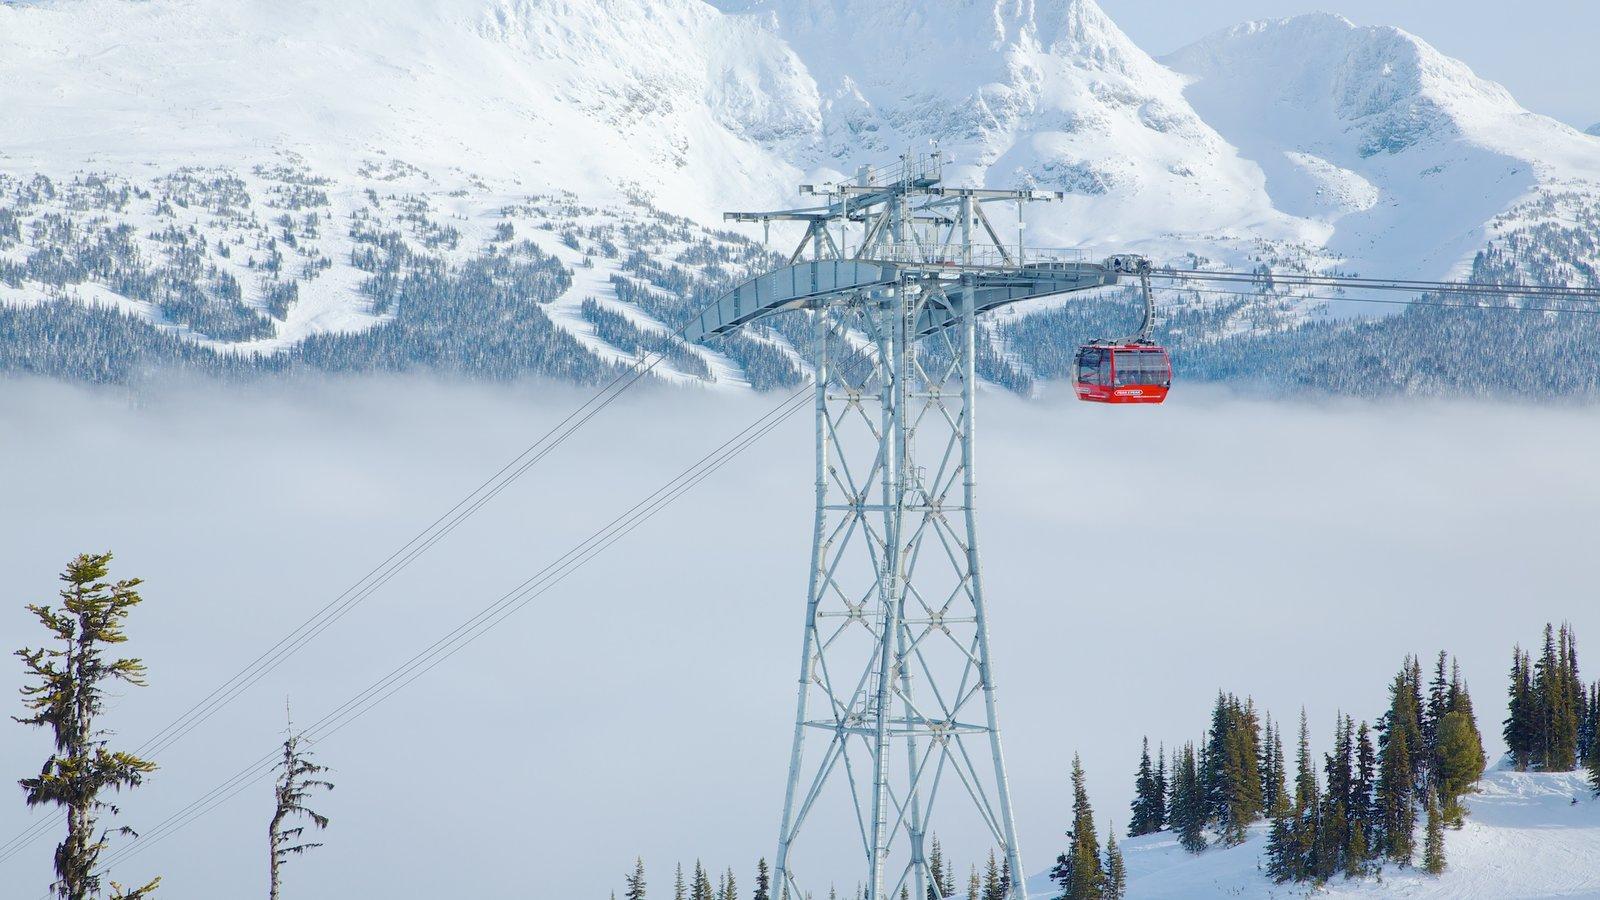 Teleférico Peak 2 Peak mostrando una góndola, neblina o niebla y nieve